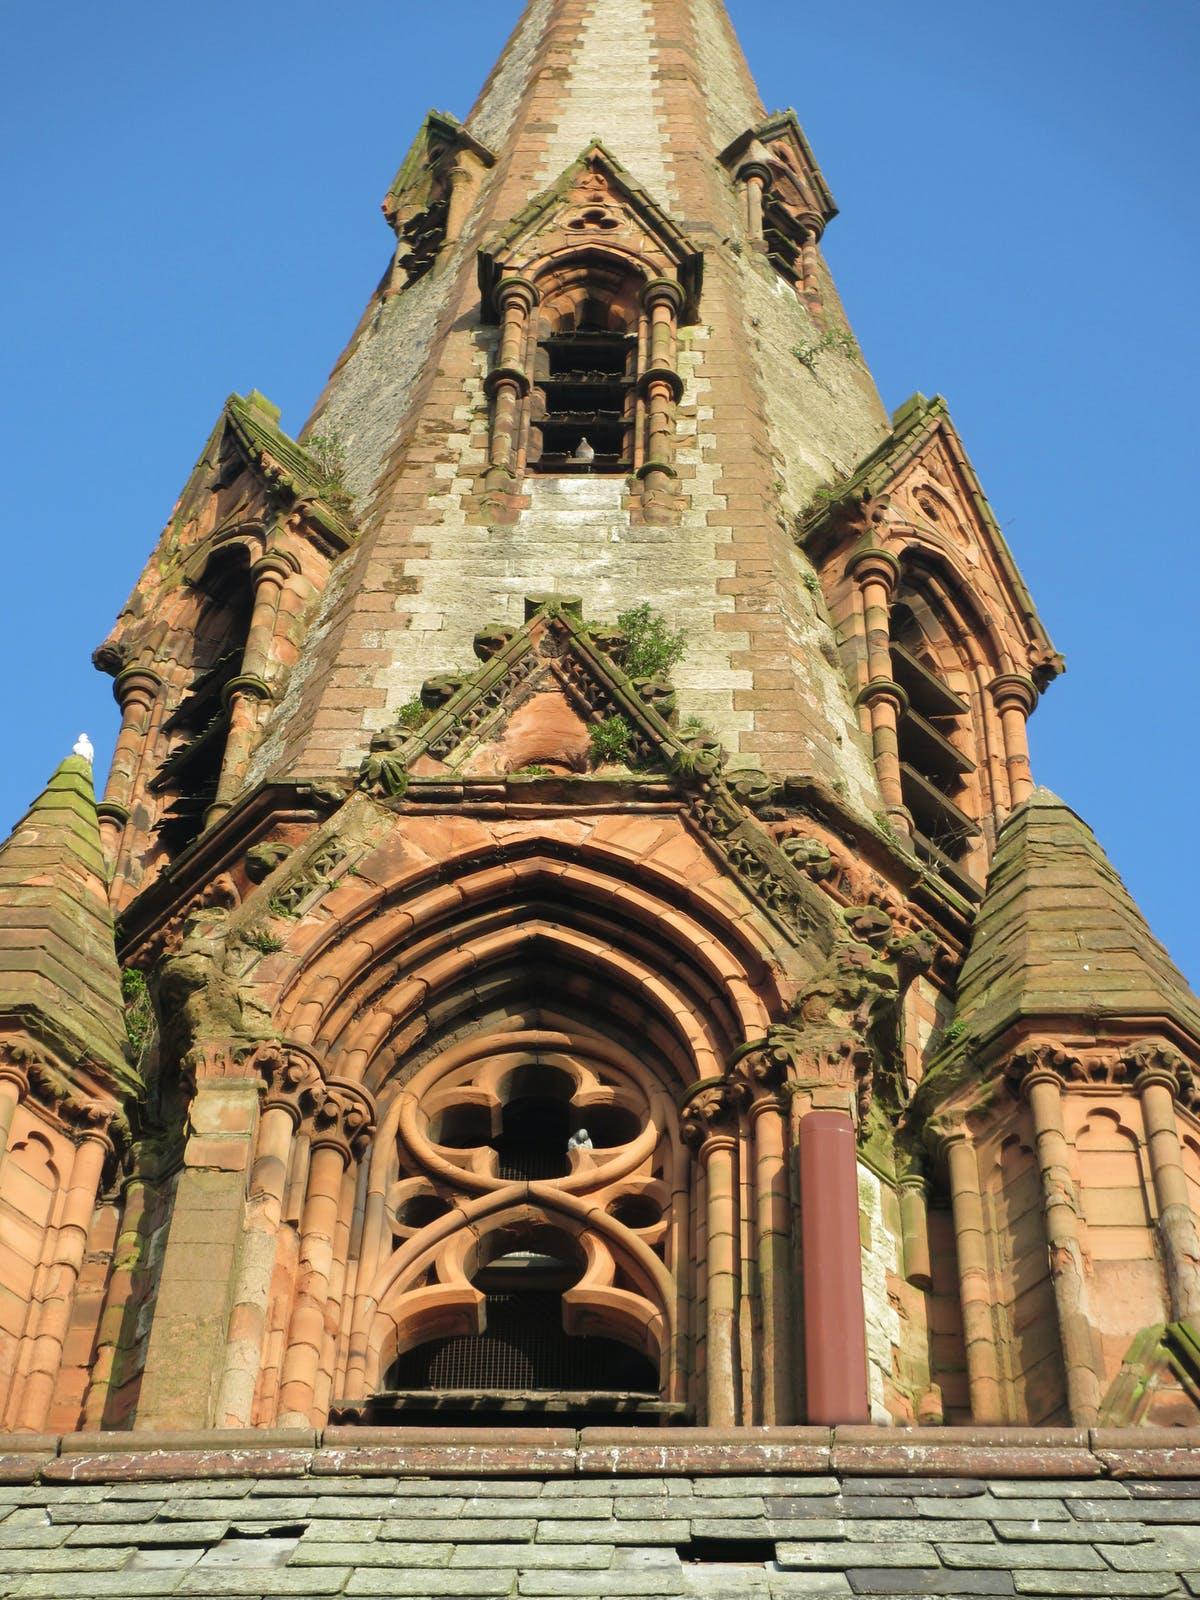 Carlisle Memorial Church